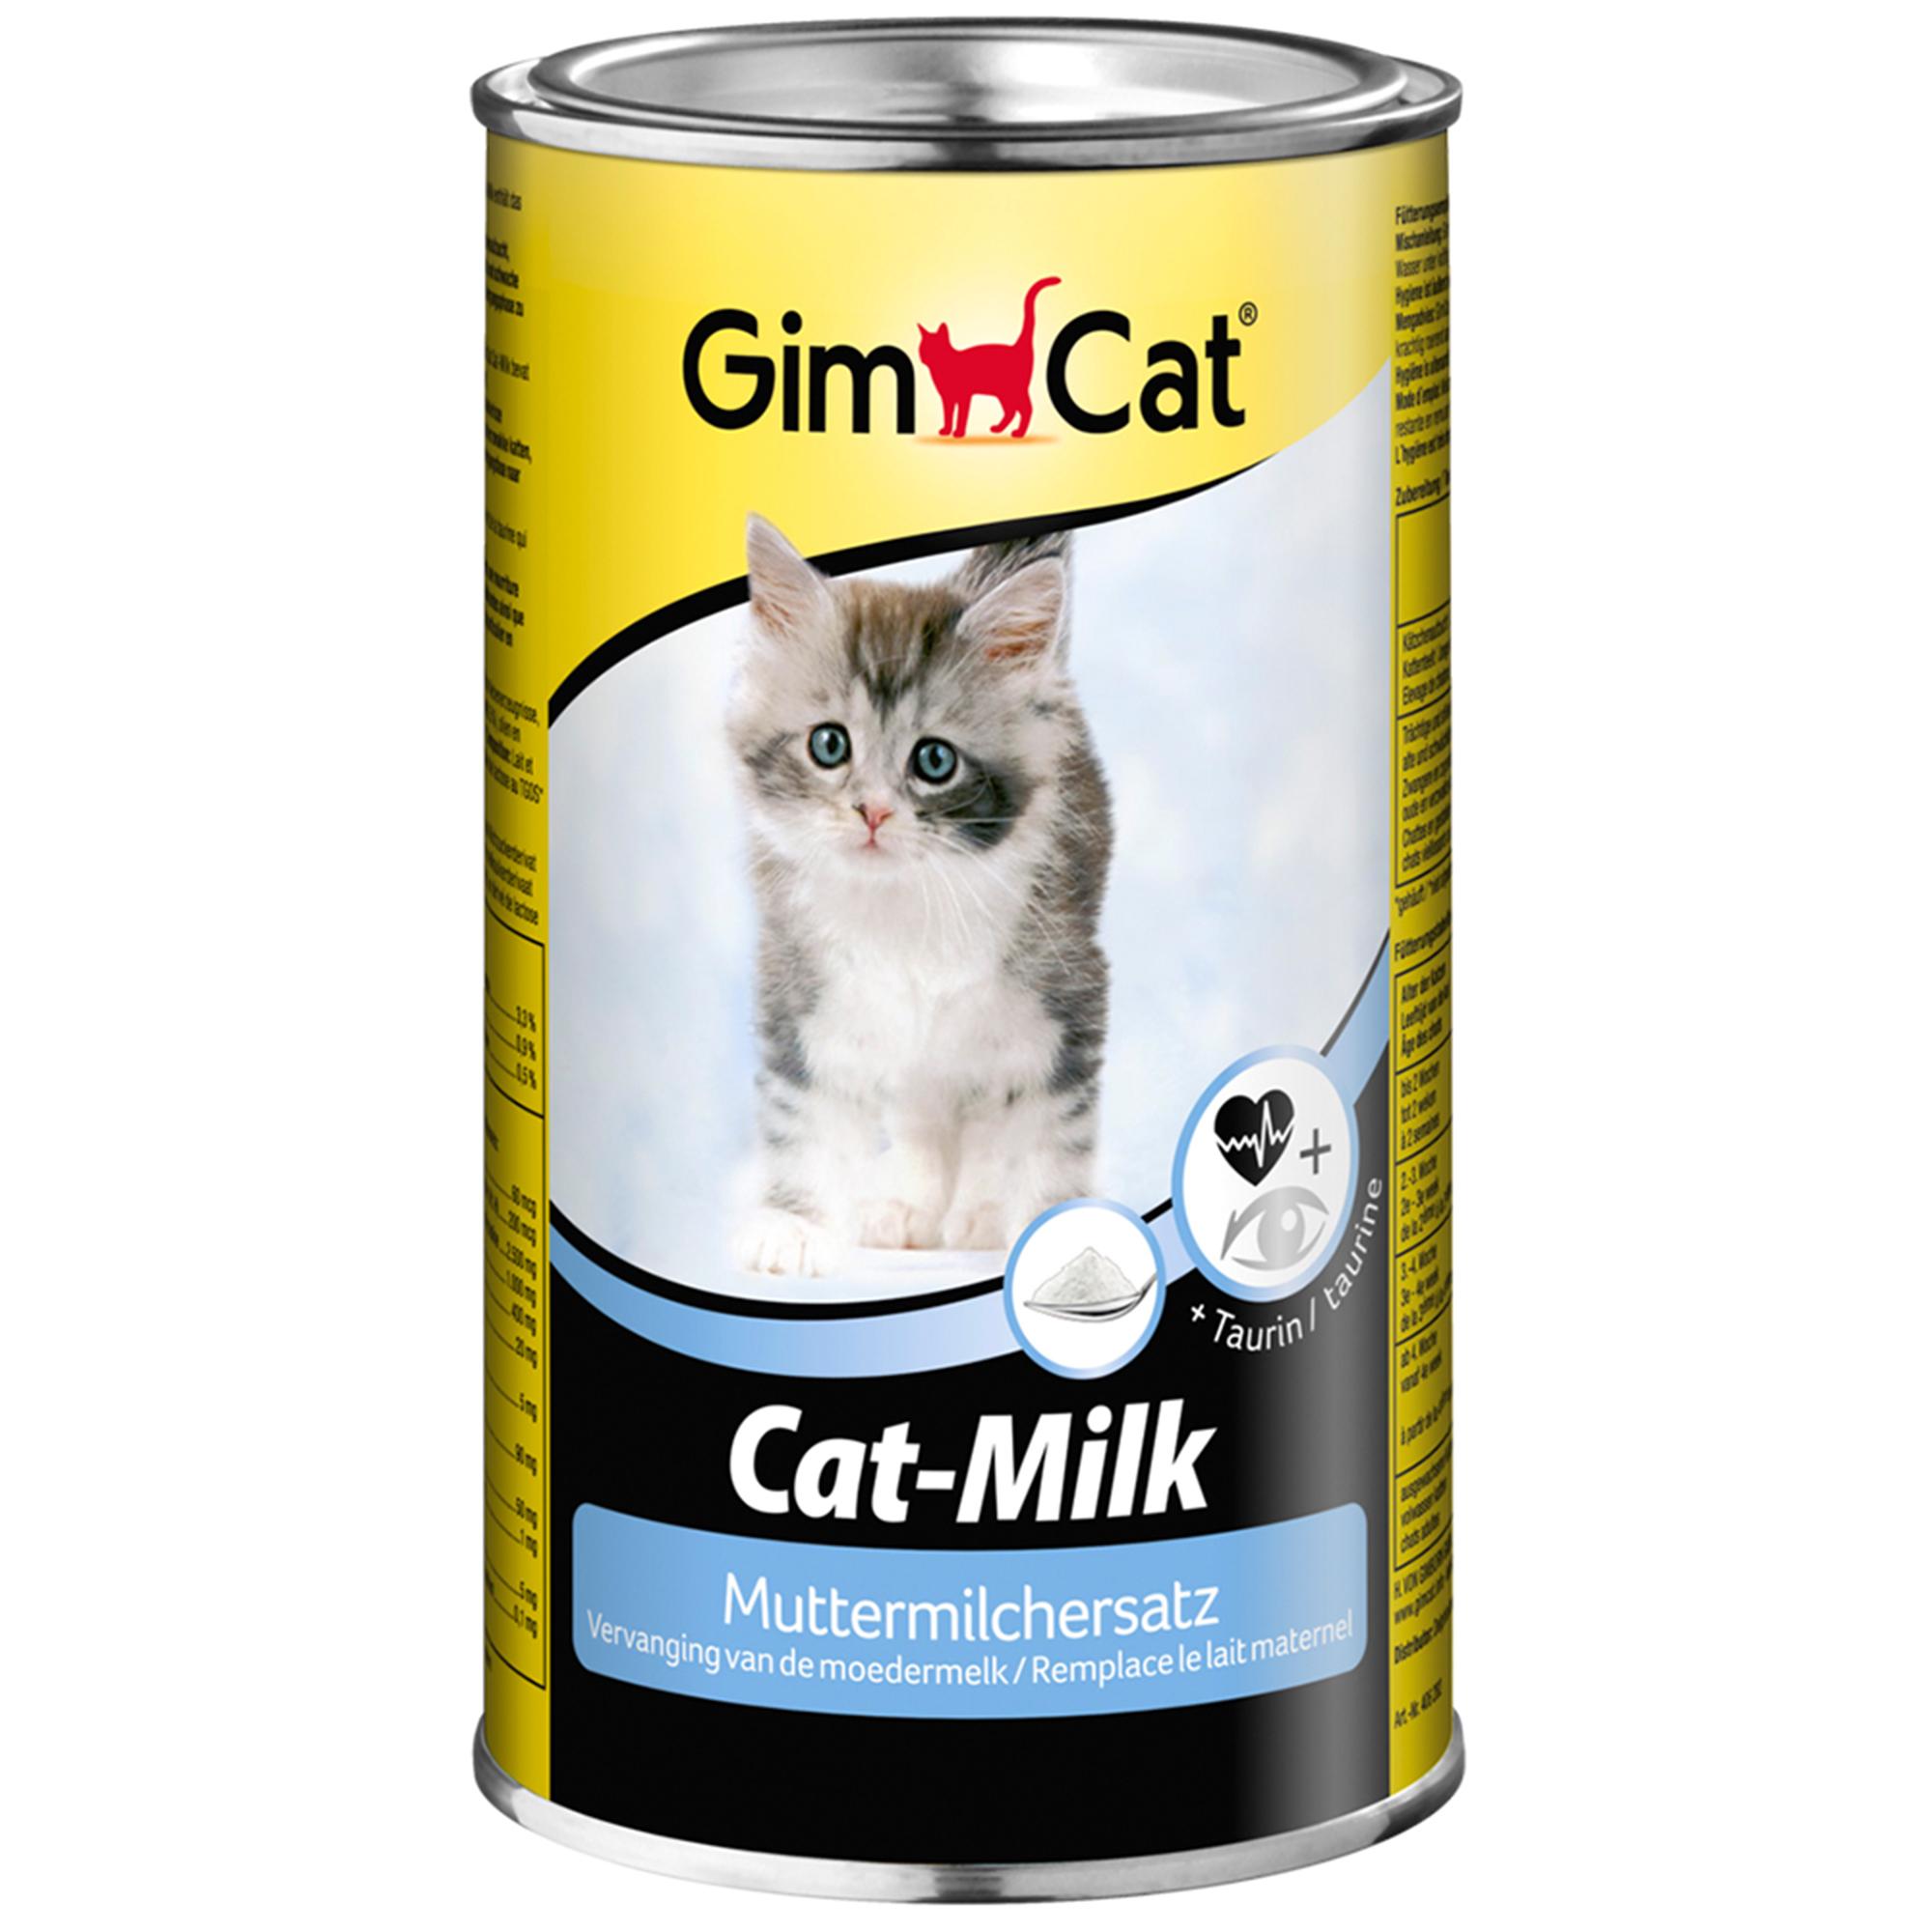 GimCat Cat-Milk 200g